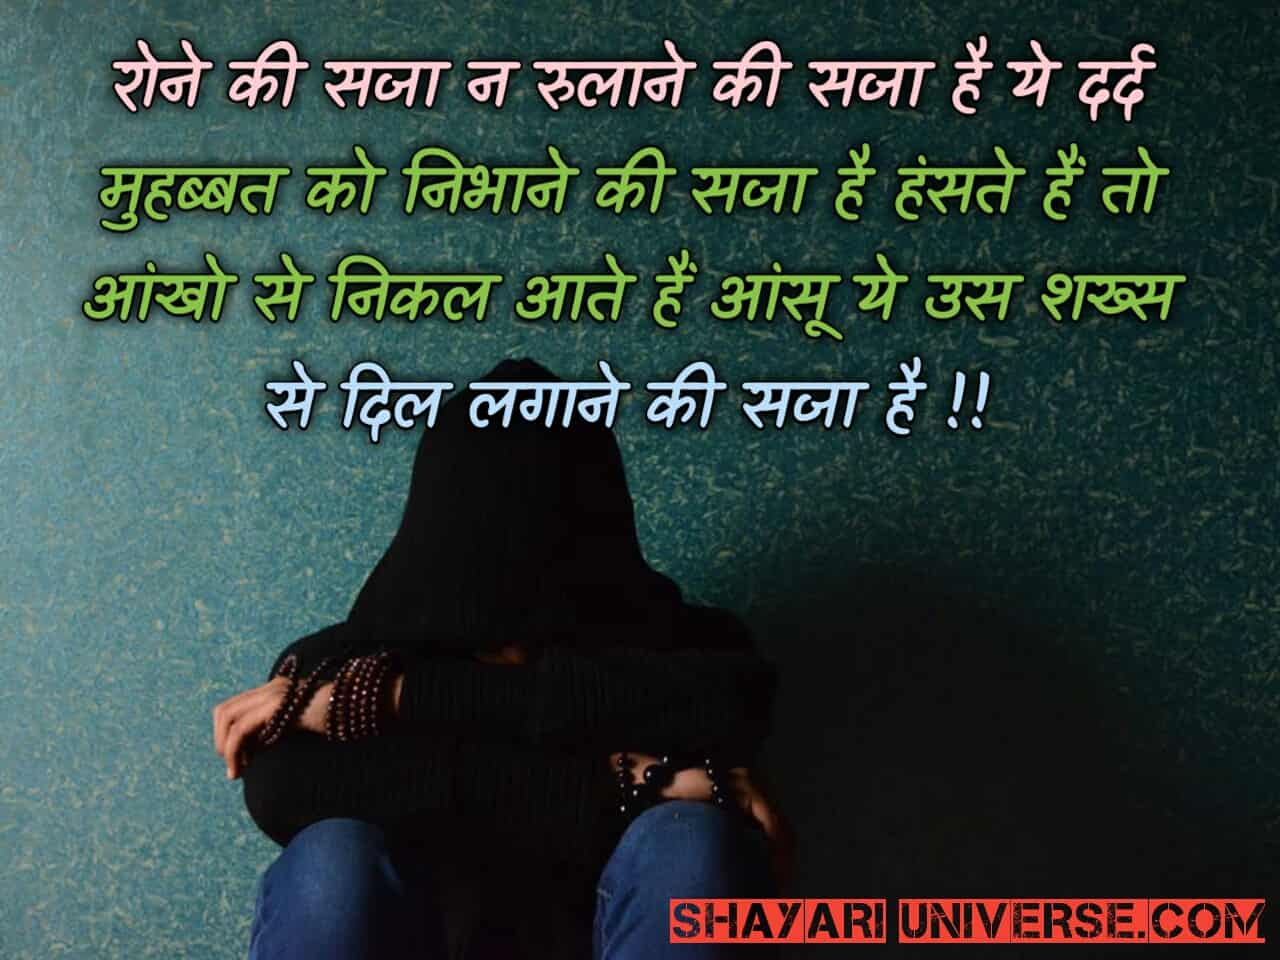 Bewafa shayari in hindi with images